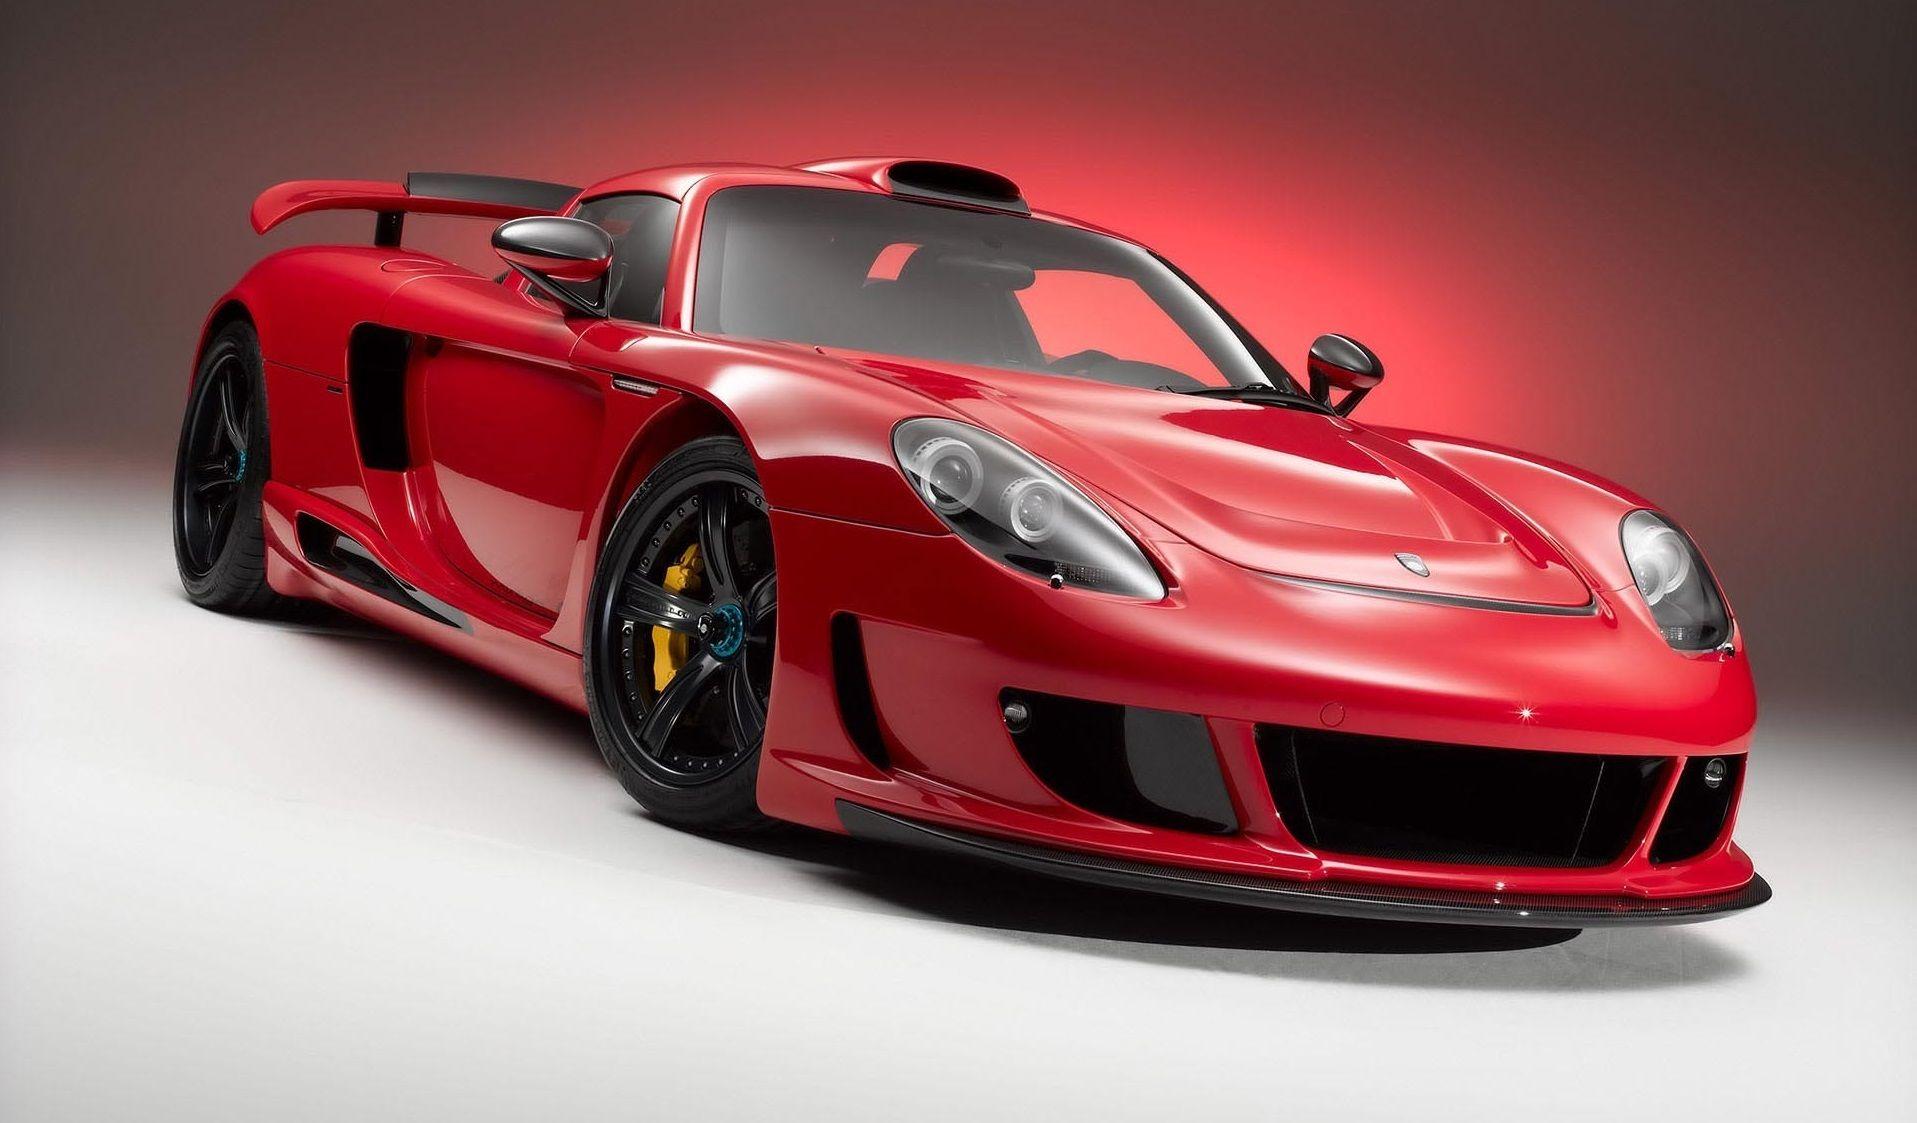 c185468f77456a1f019ef5ec11ab8a24 Stunning Ficha Tecnica Porsche 918 Spyder Concept Cars Trend